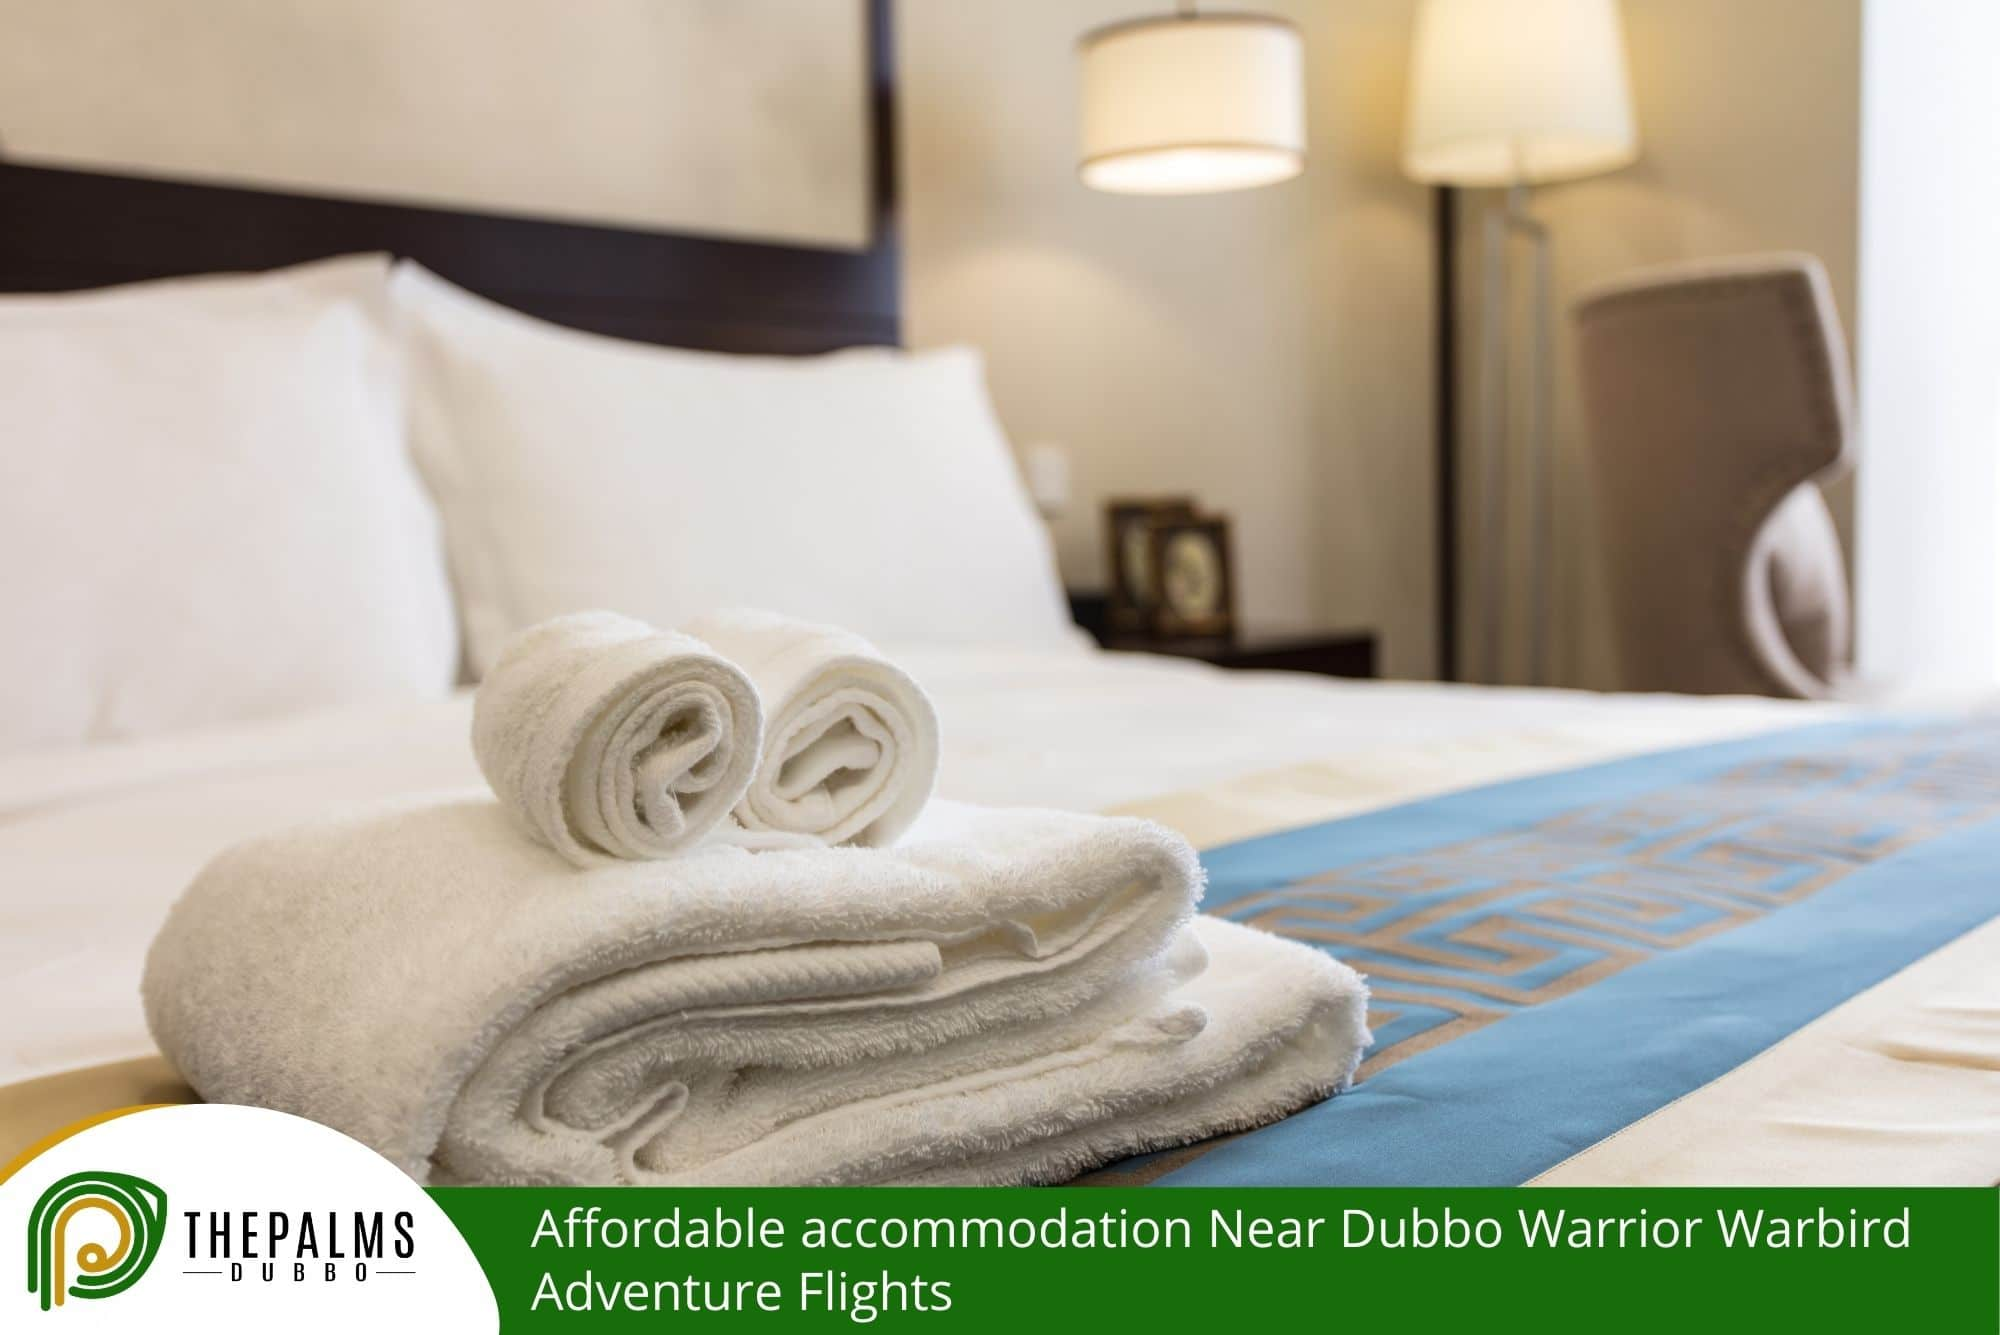 Affordable accommodation Near Dubbo Warrior Warbird Adventure Flights